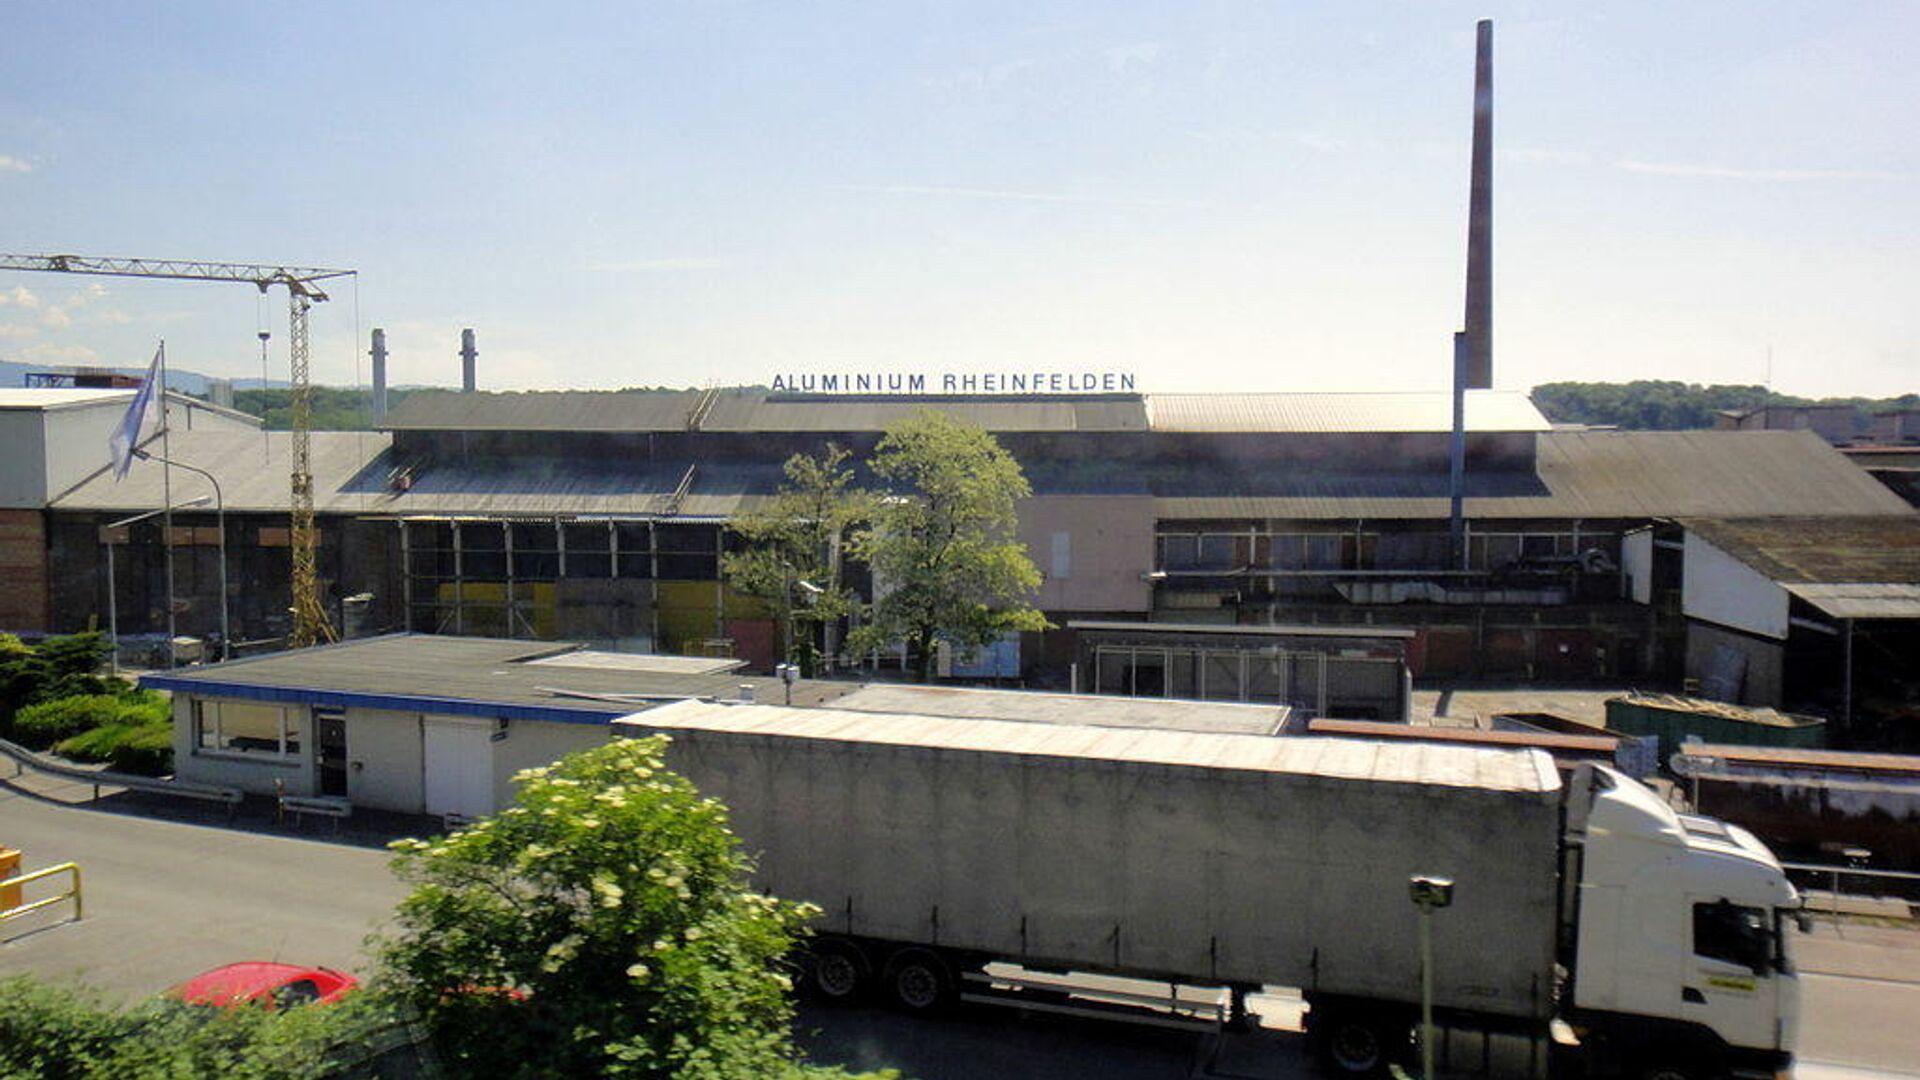 Fabrik von Aluminium Rheinfelden (Archivbild) - SNA, 1920, 12.04.2021